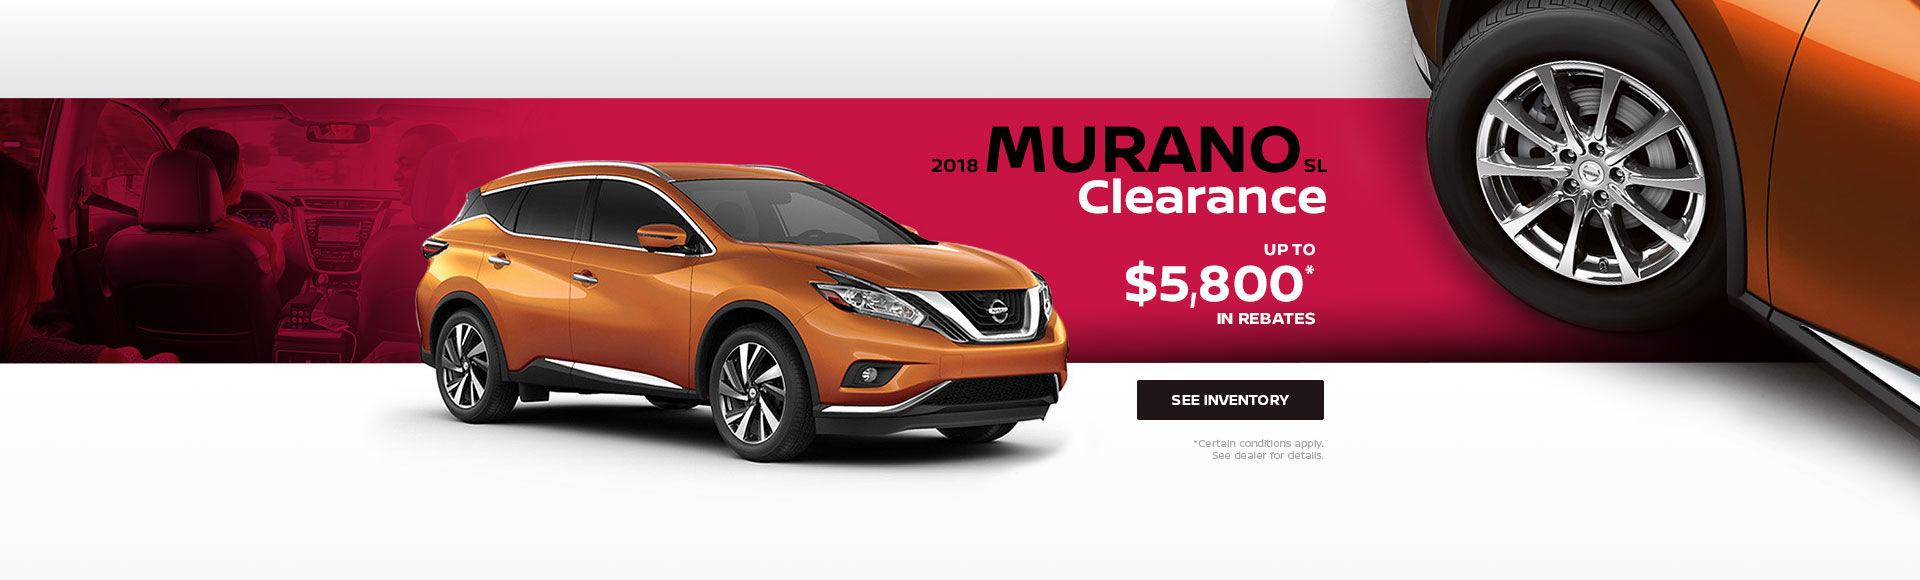 2018 Murano Clearance